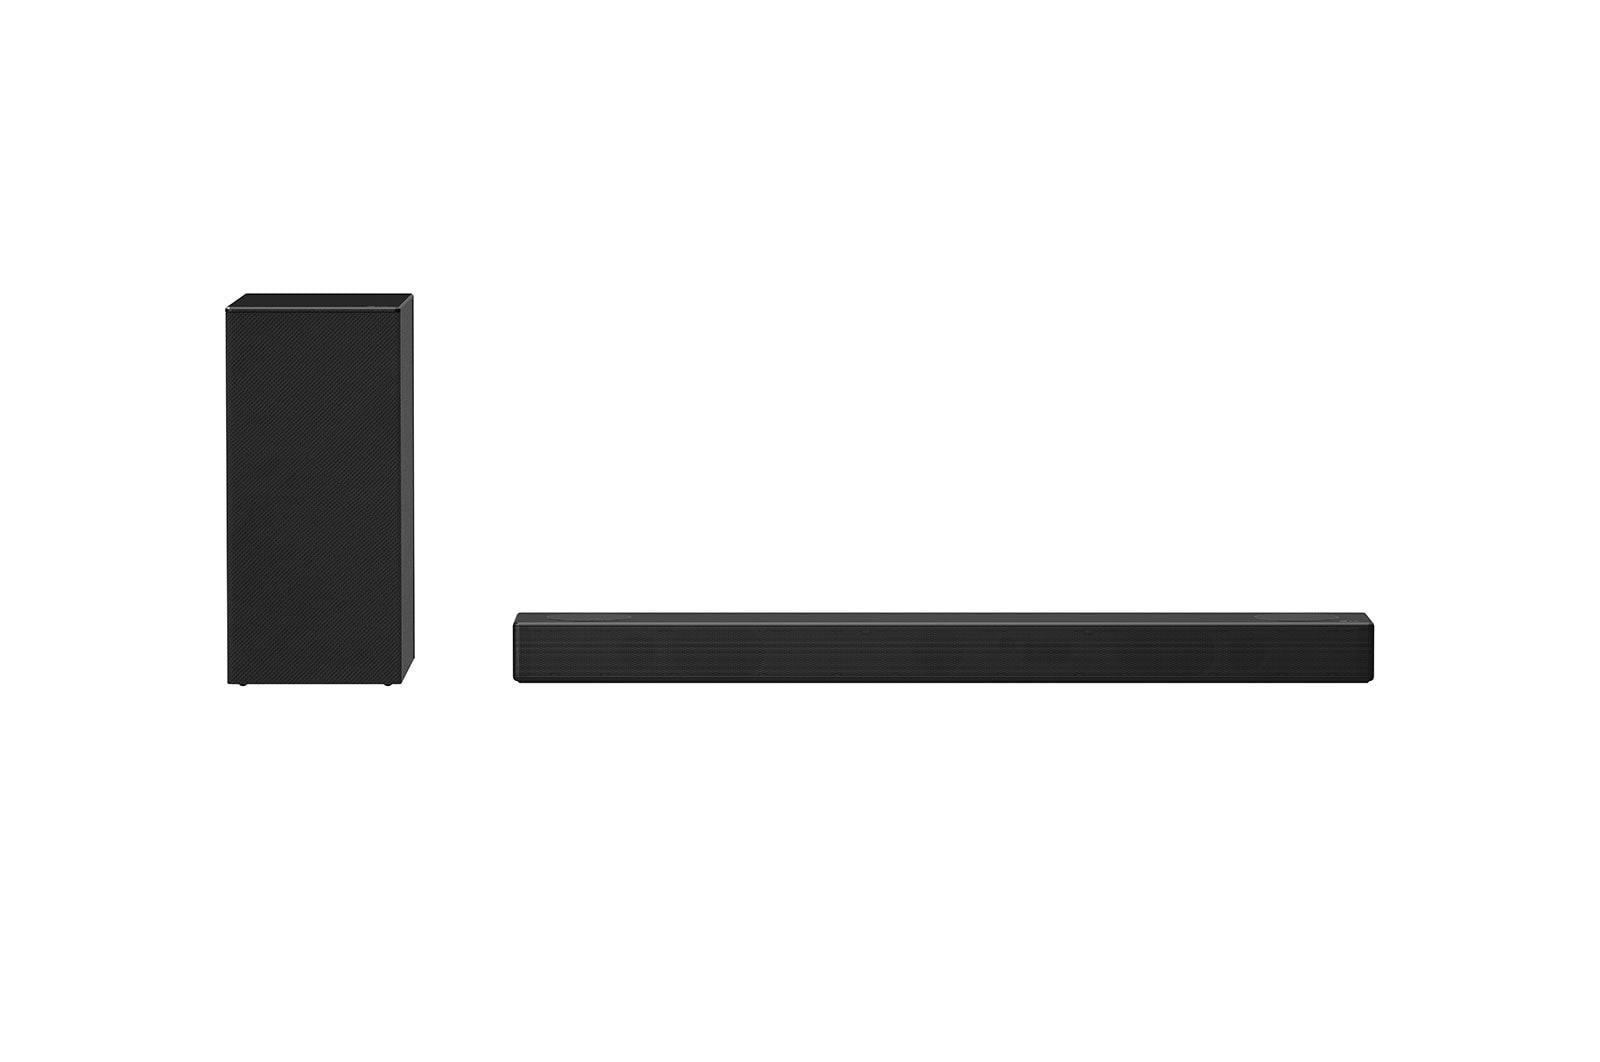 LG DSN7 Soundbar